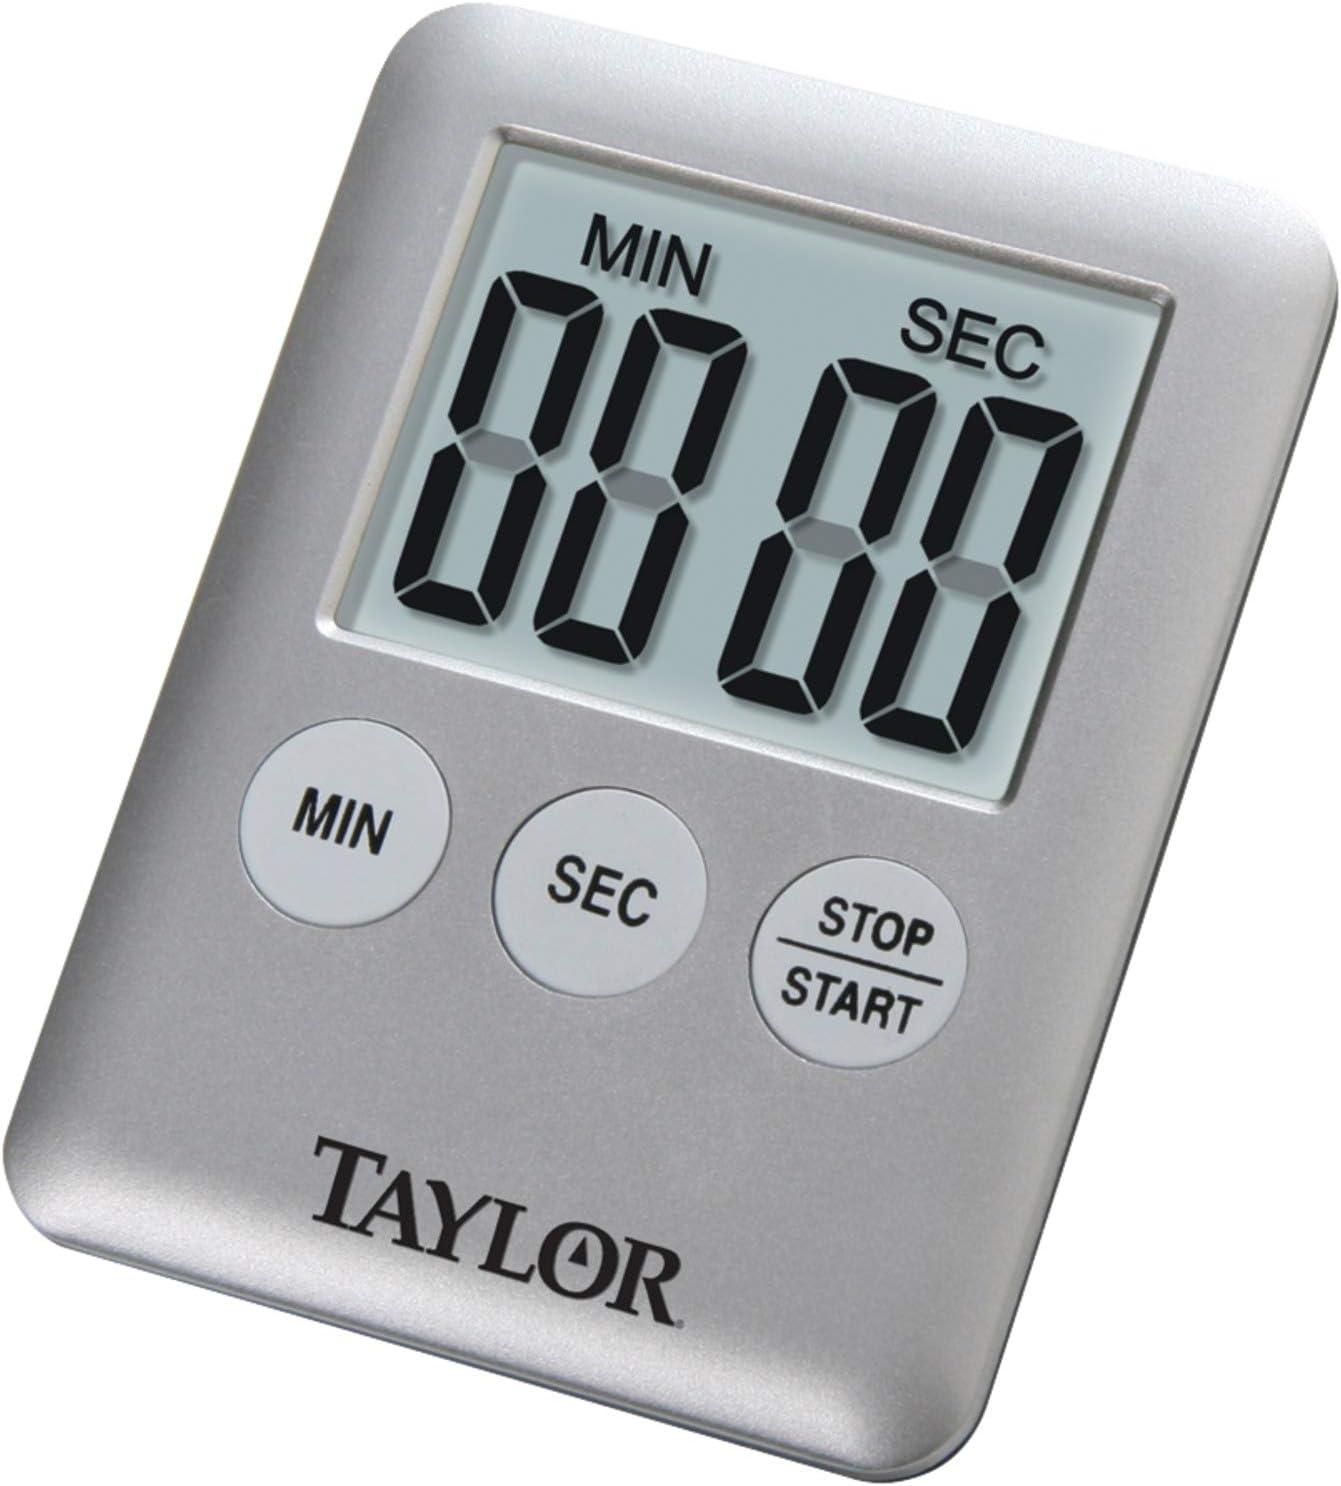 Taylor Mini Timer Digital, Magnetic